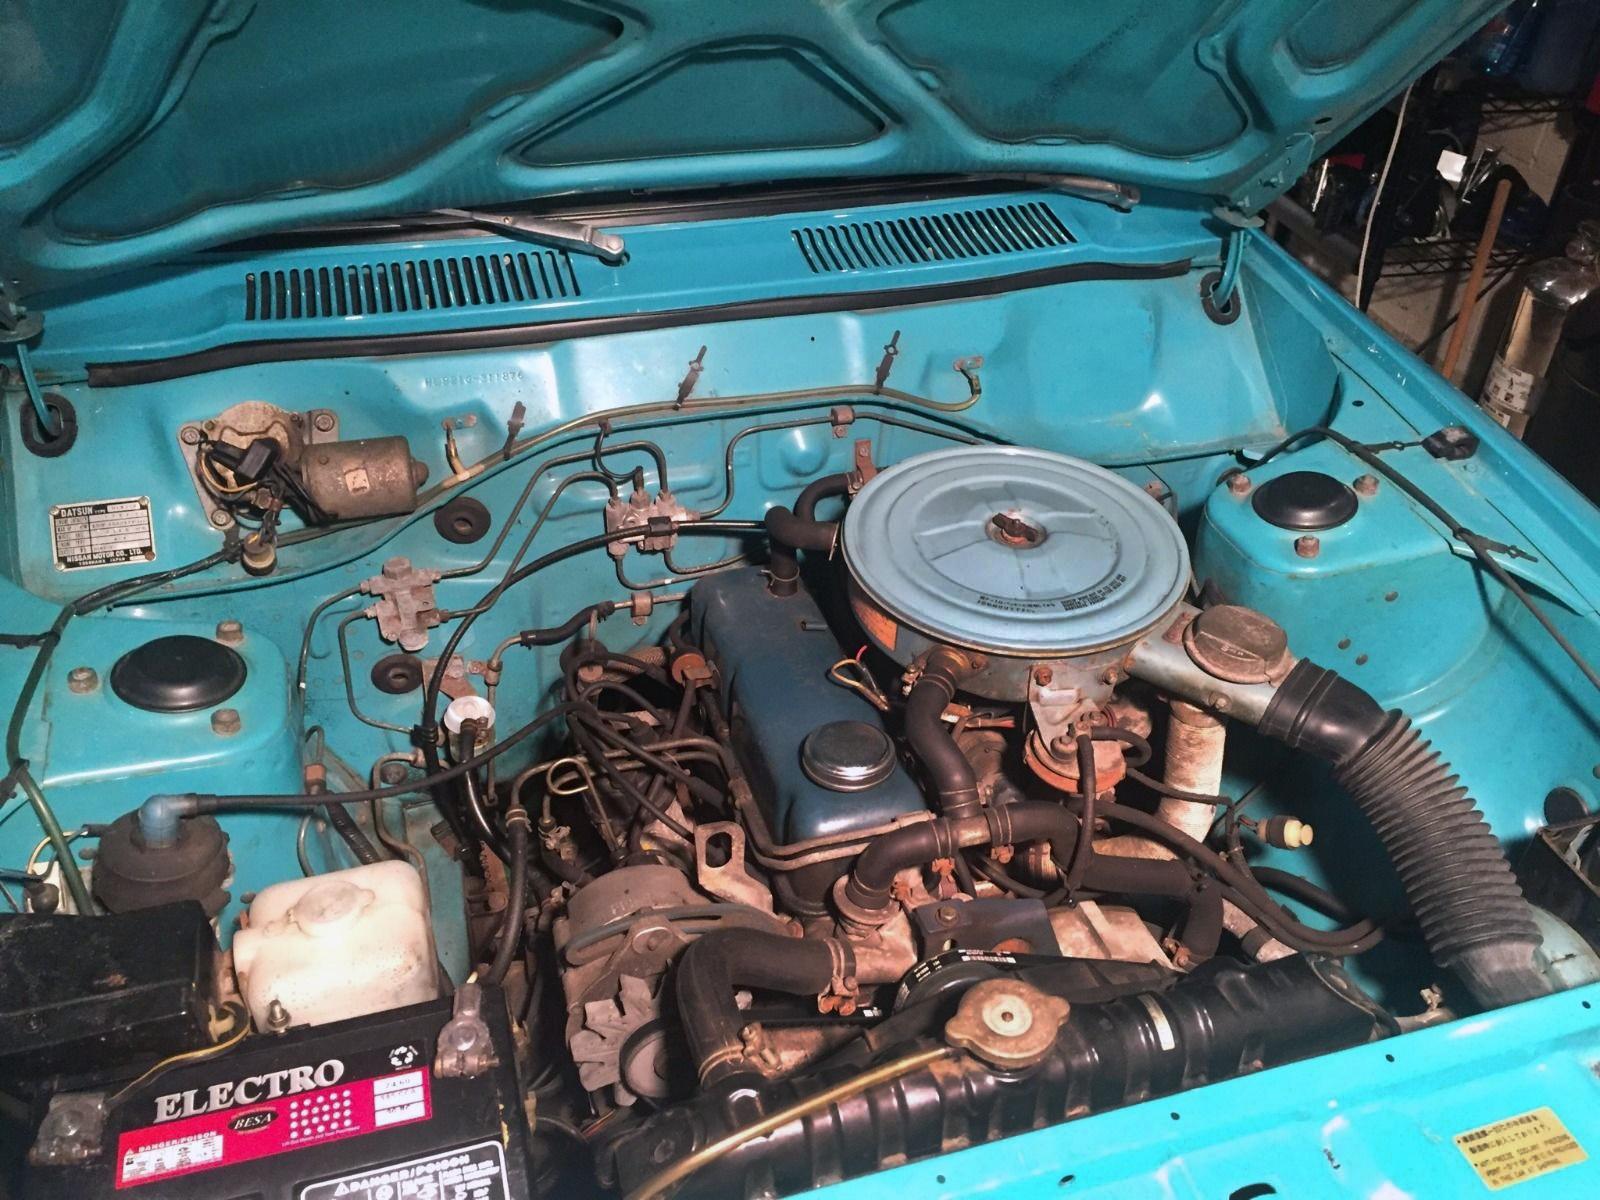 38 000 mile one owner 1977 datsun b210 sedan